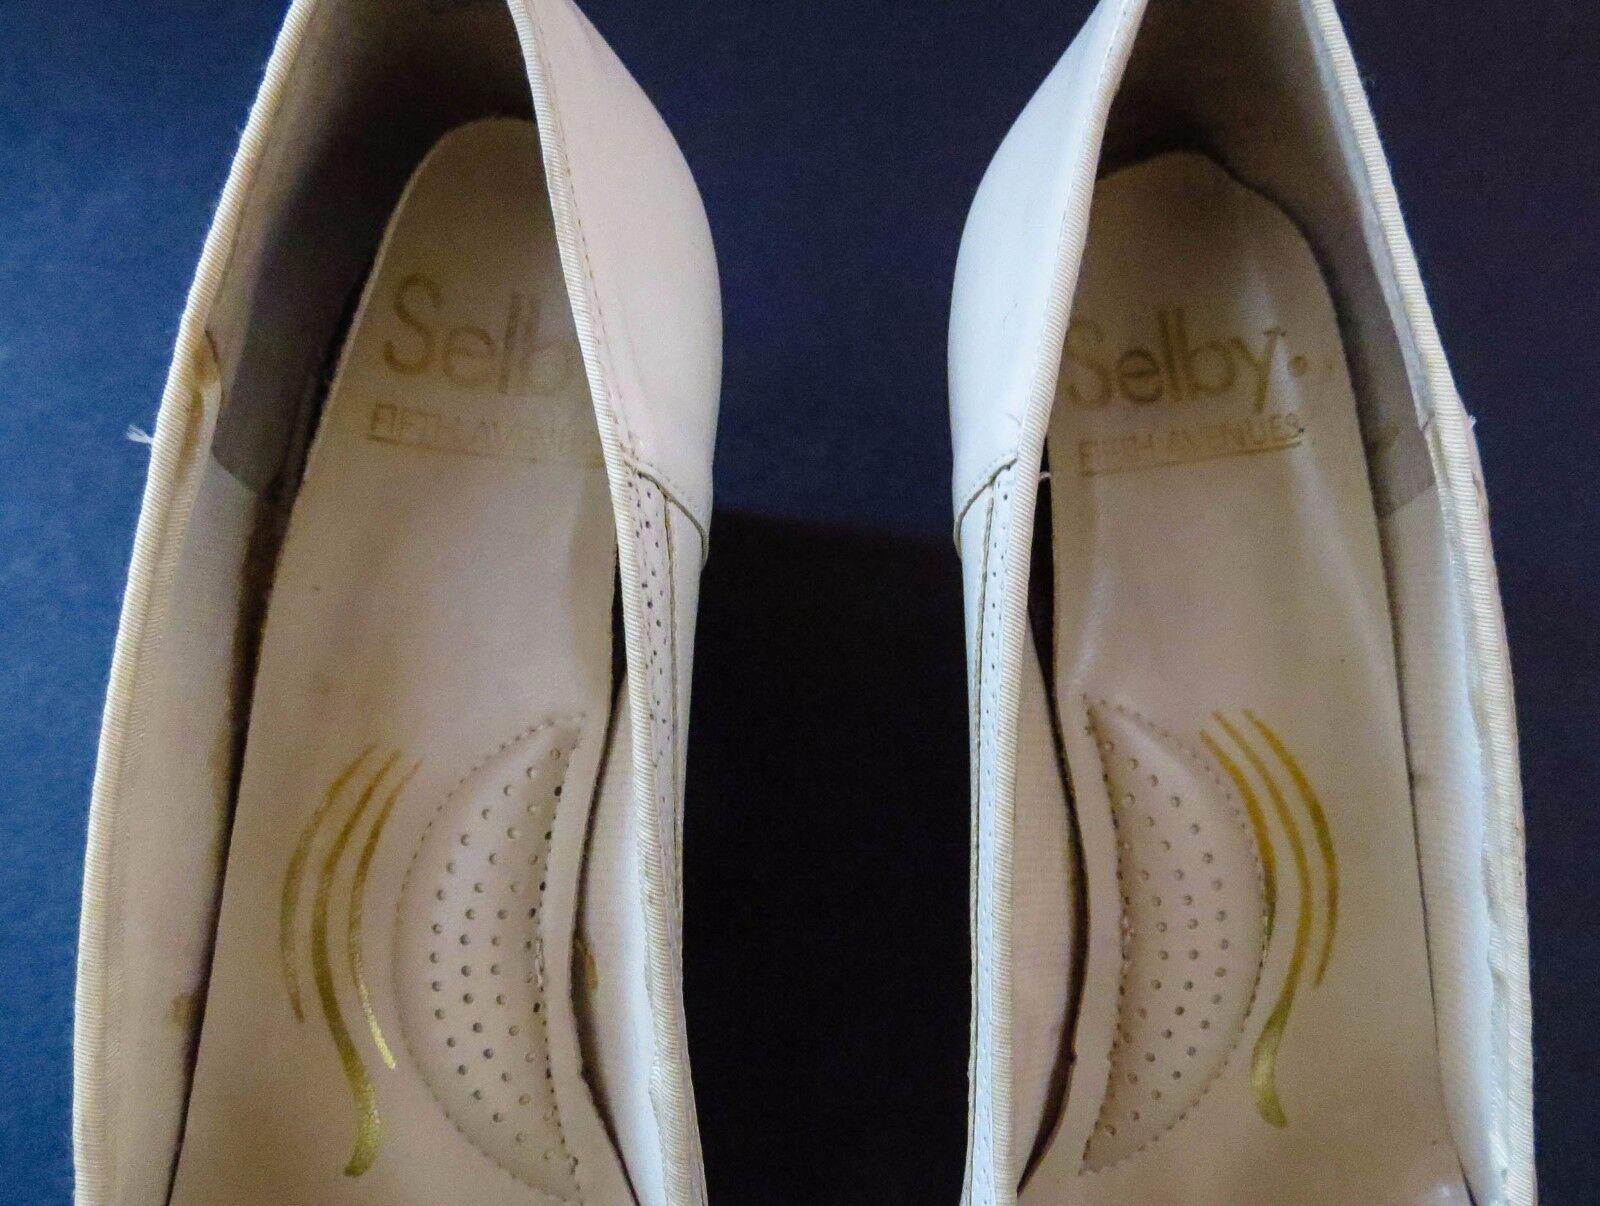 Vintage Selby Größe 8 ½ ½ ½ B Rory Bone Perforated Leather Pumps Medium Heels in Box 87b271